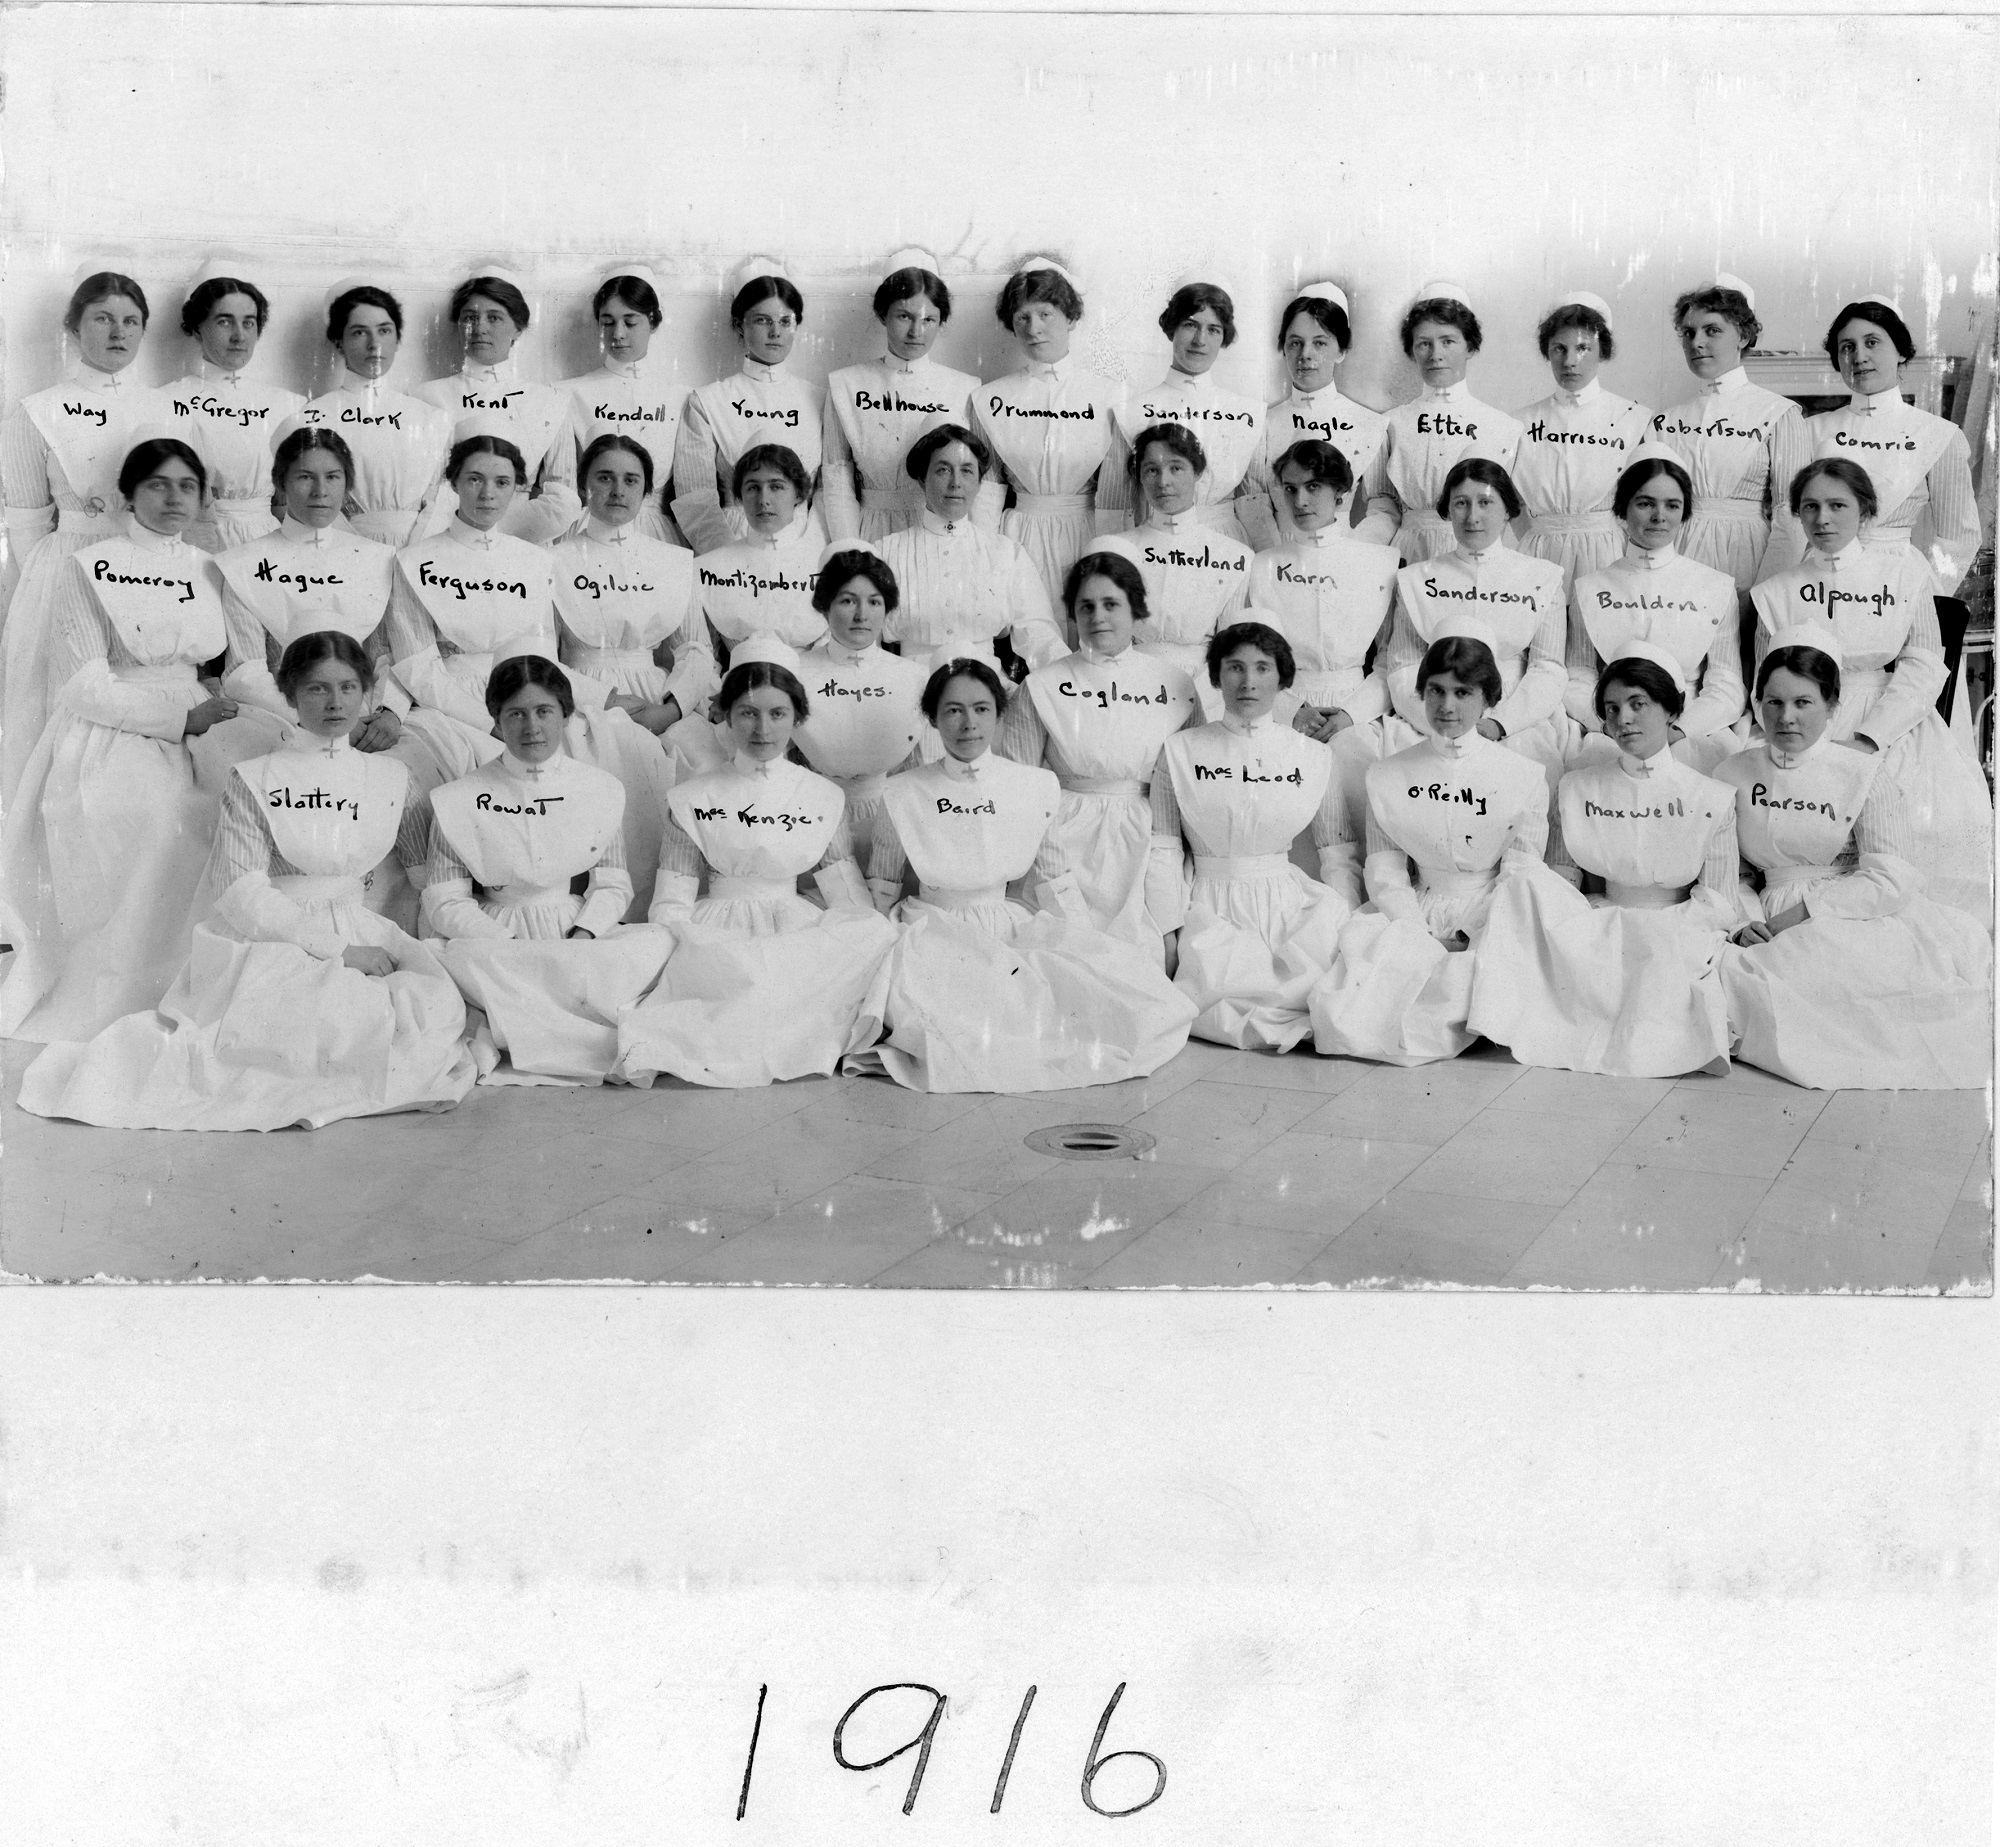 Graduating class of 1916